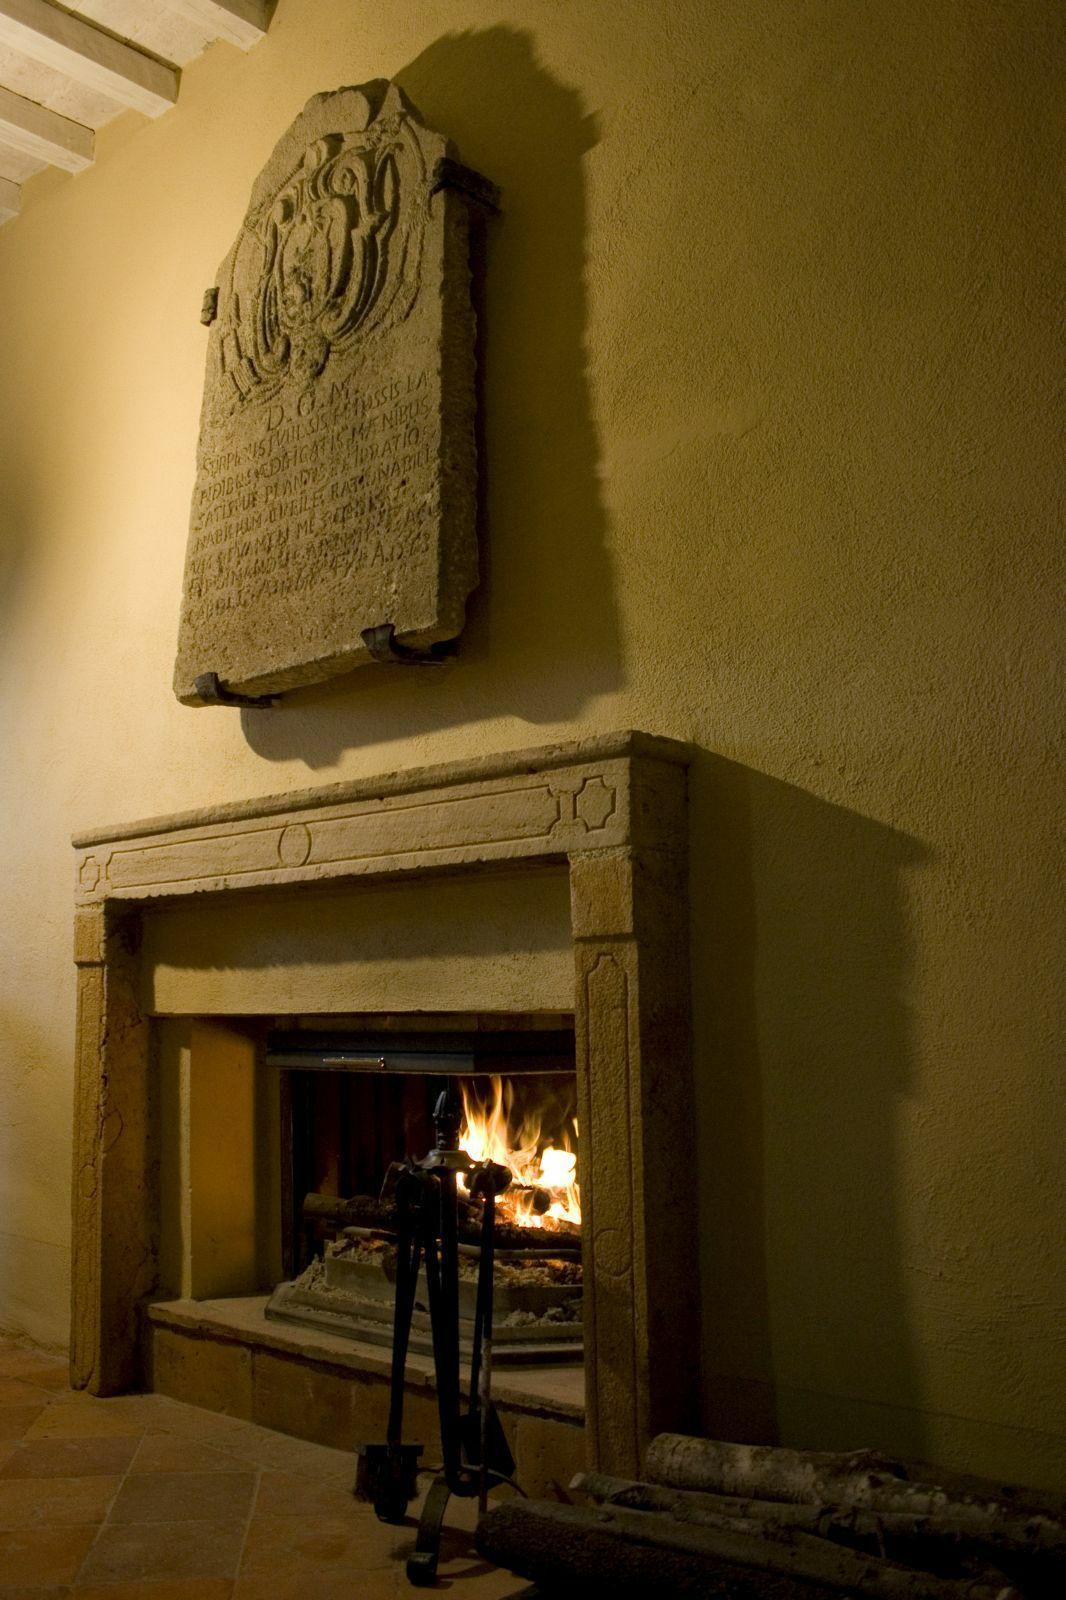 The castle inside micciano pomarance pisa italymansion for Sala da pranzo versace